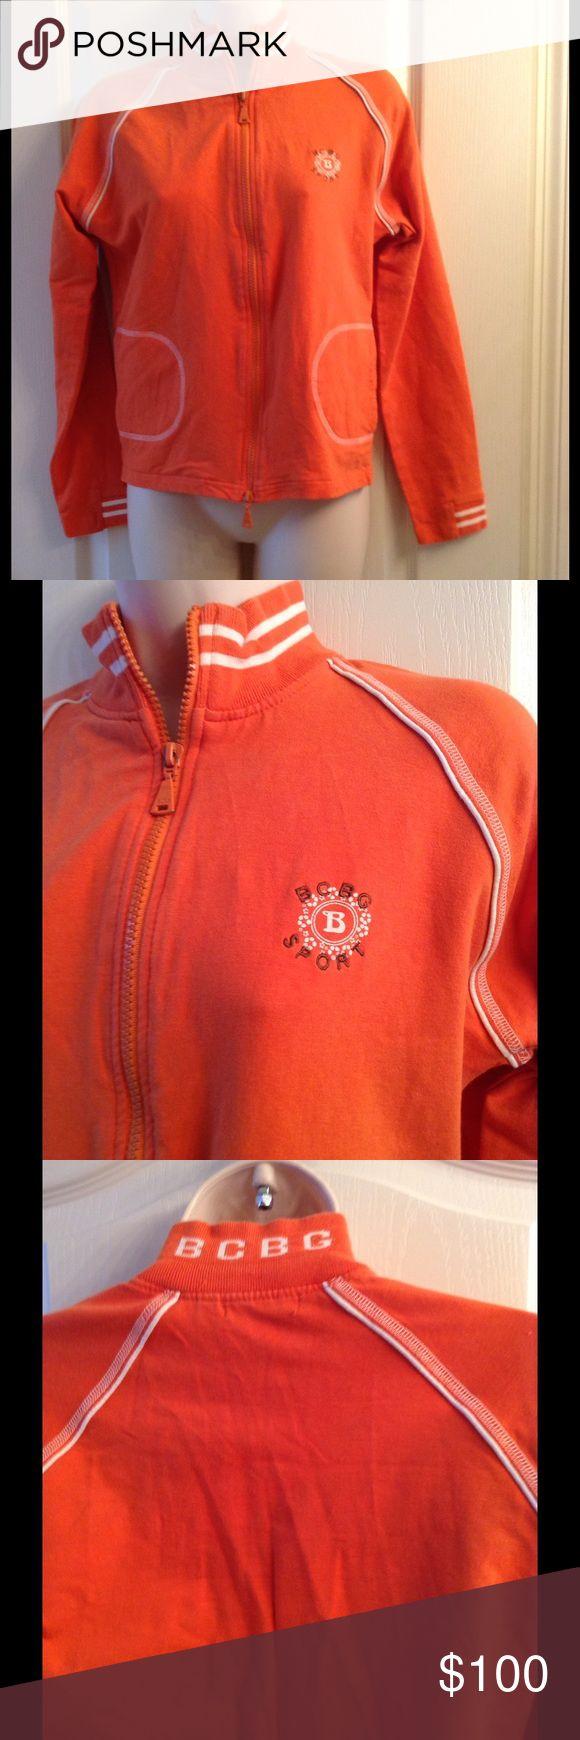 BCBGMAXAZRIA L Comfortable Orange jacket Jackets & Coats